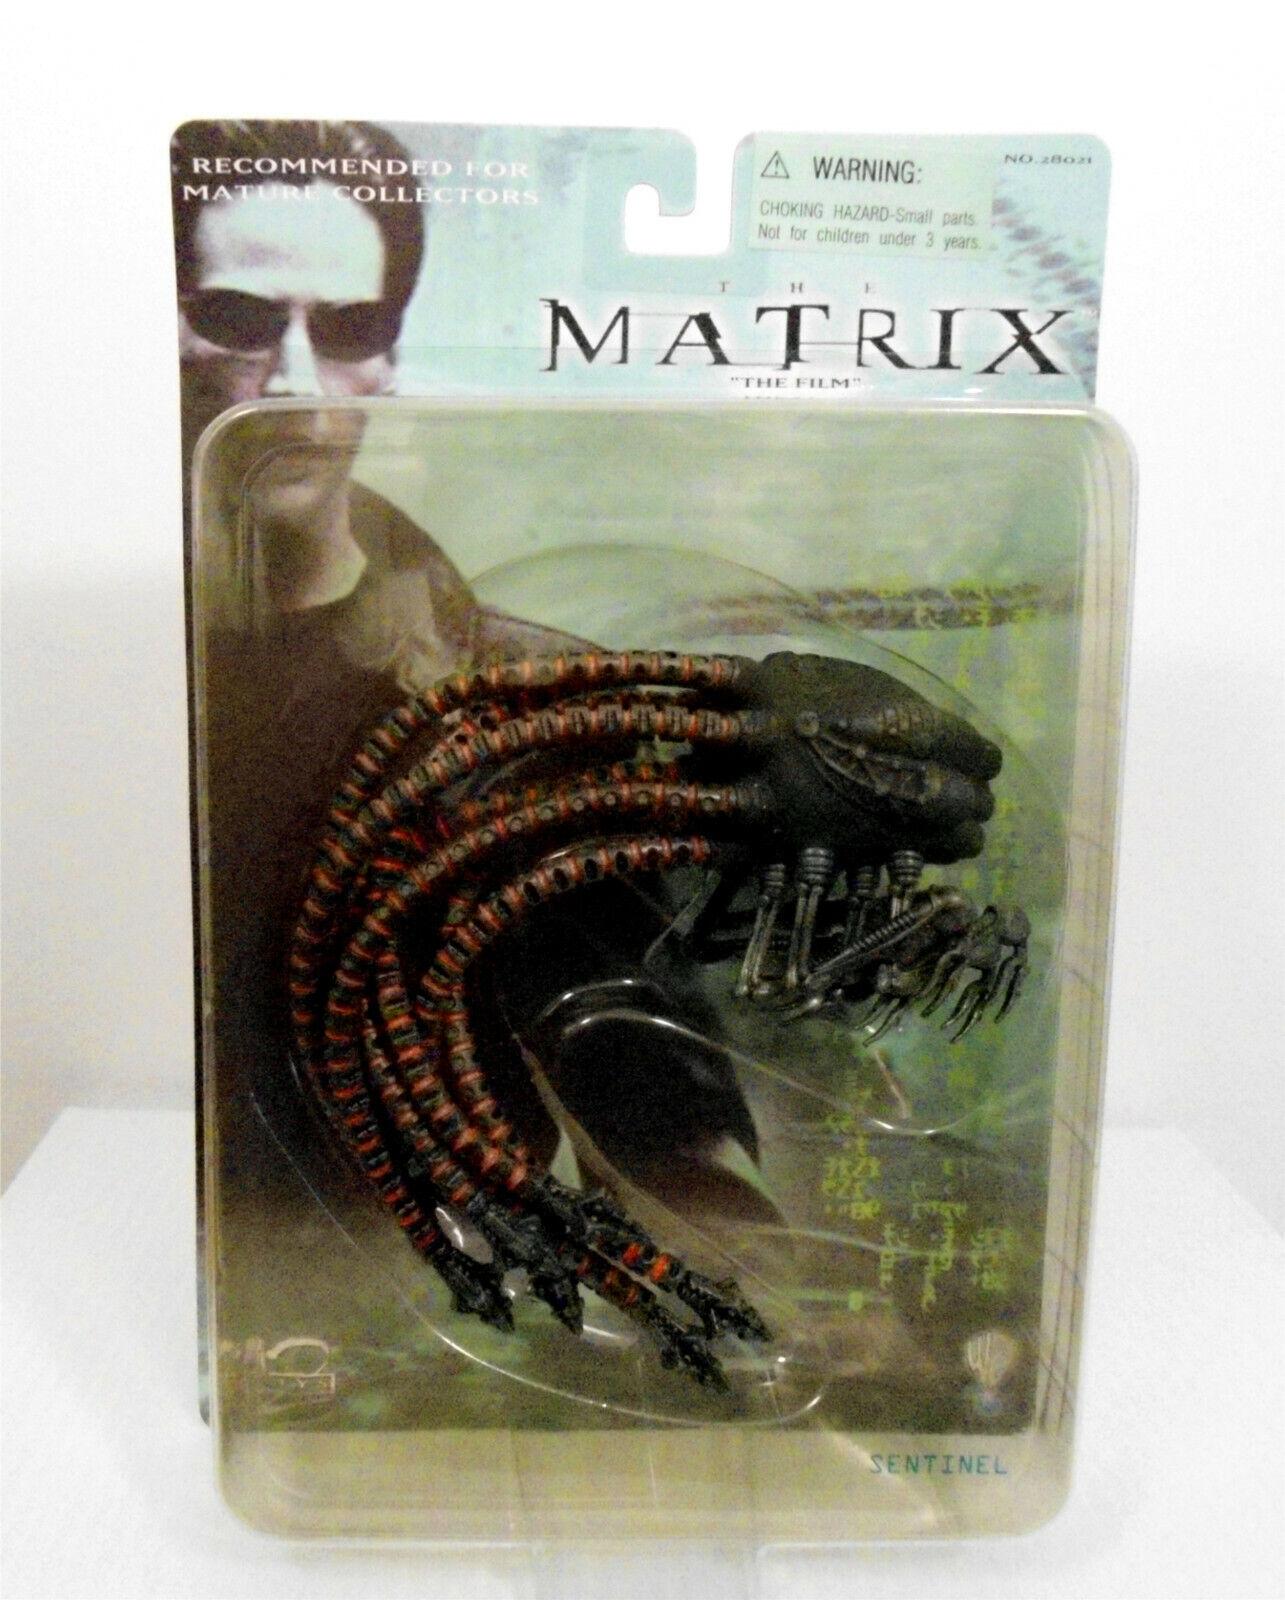 The Matrix The Movie Sentinel azione cifra N2 giocattoli 2000 Reeves Fishburne